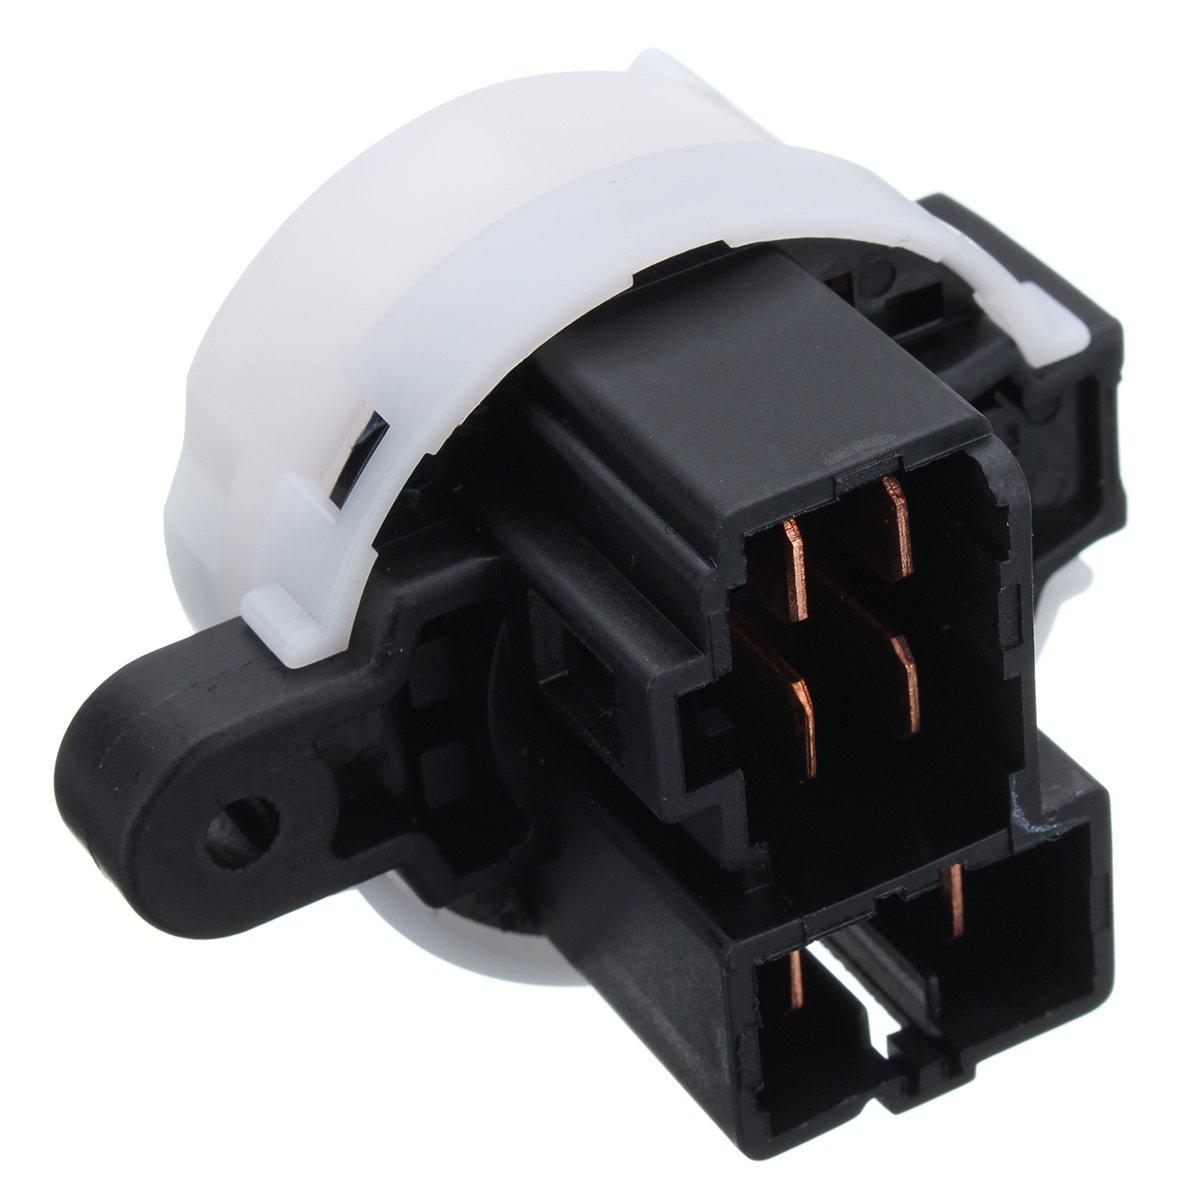 Viviance Ignition Starter Switch For Ford Ranger 2500 Mazda B Series Premacy GE4T66151